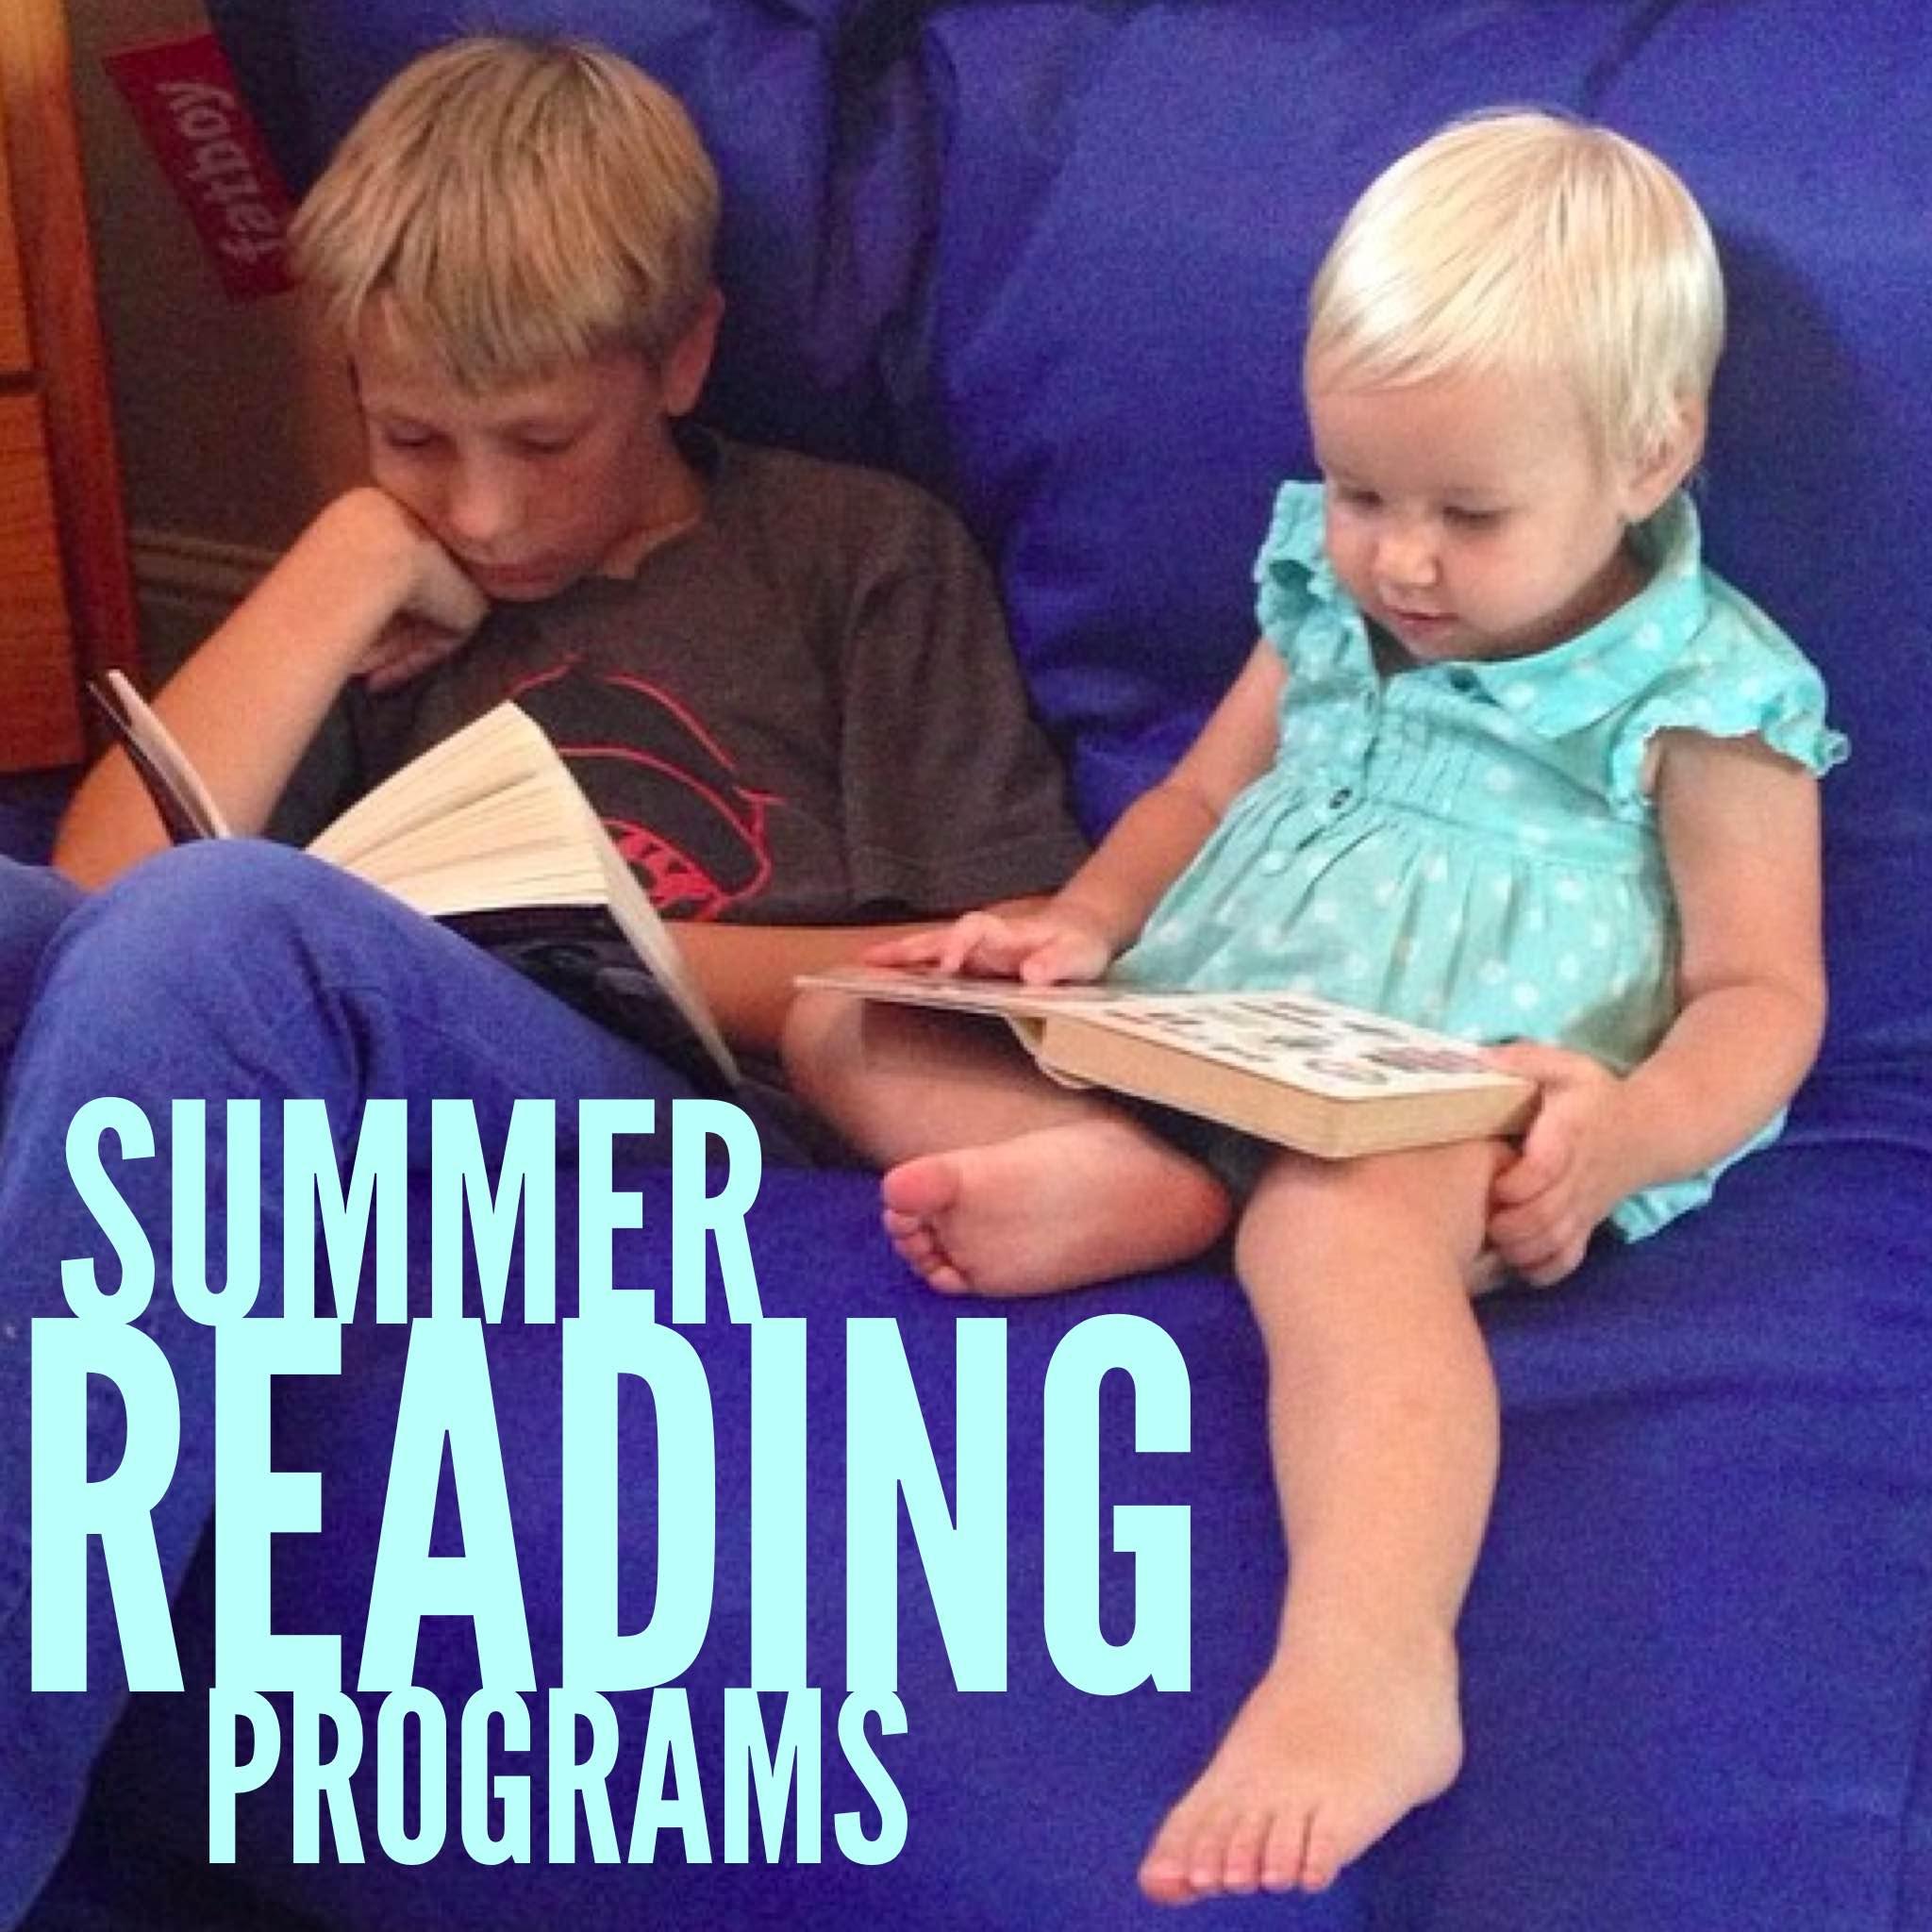 Austin Summer Reading Programs 2015